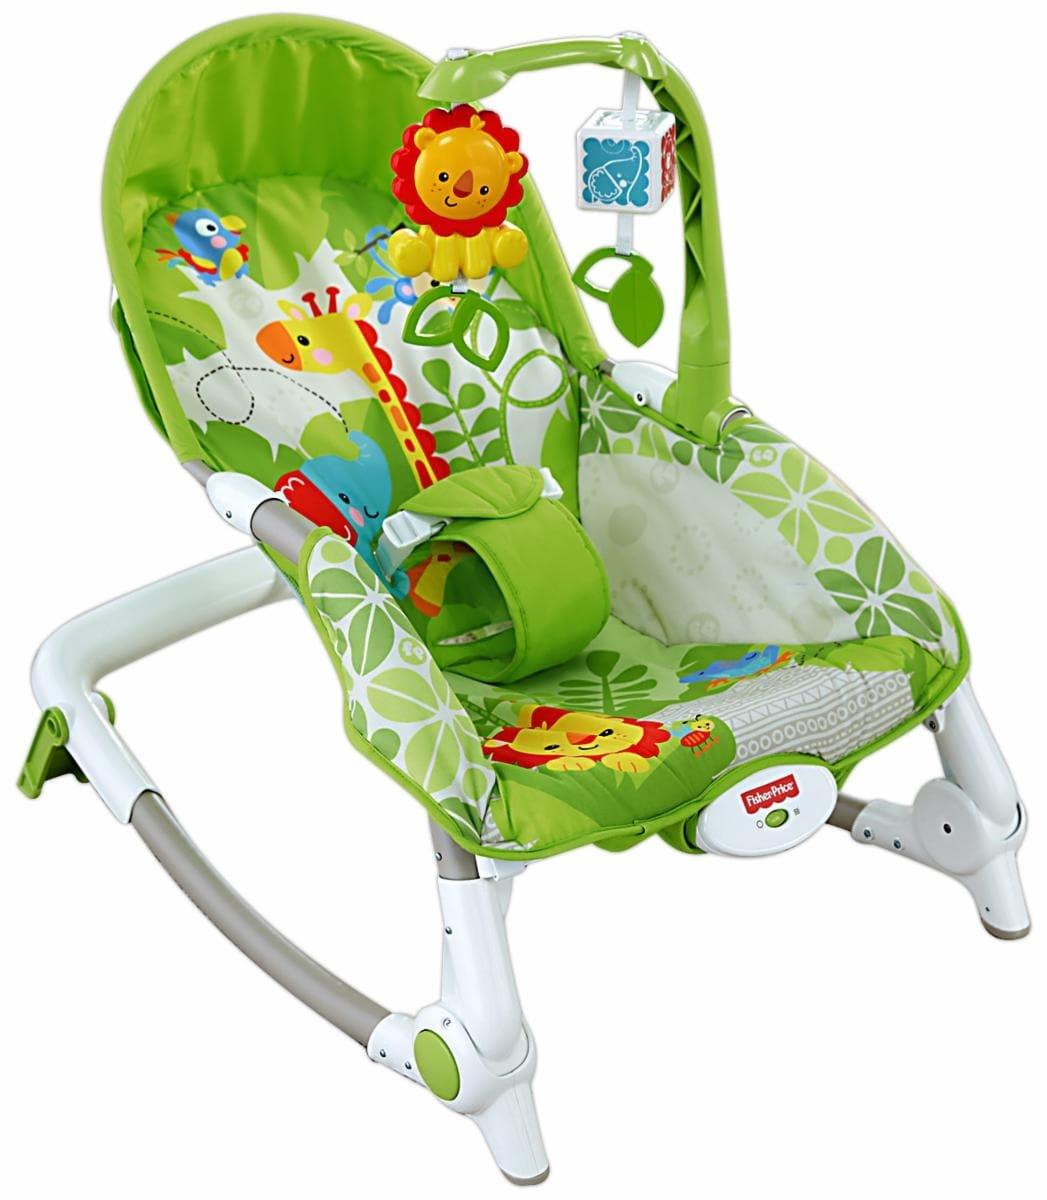 /N/e/Newborn-to-Toddler-Discover-n-Grow-Rocker-7796967.jpg